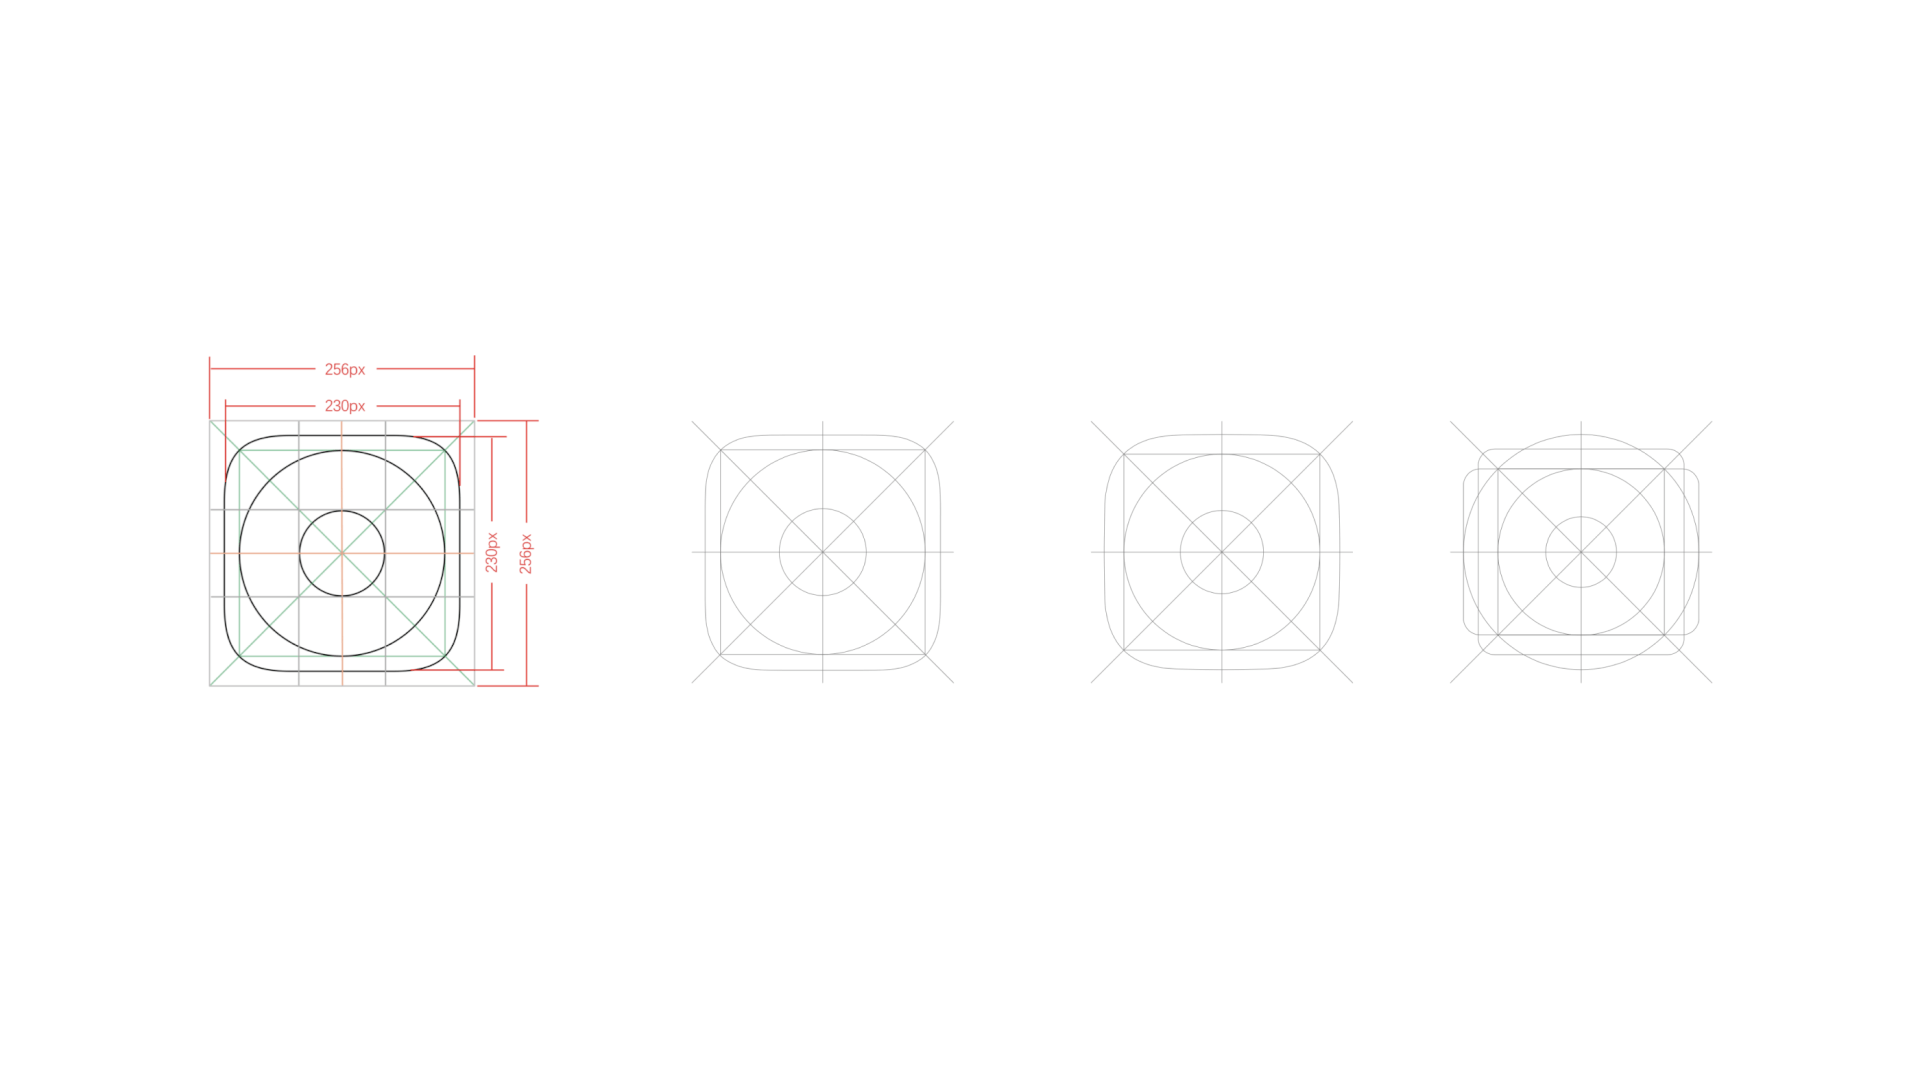 HUAWEI_EMUI_icons_tubik design structure